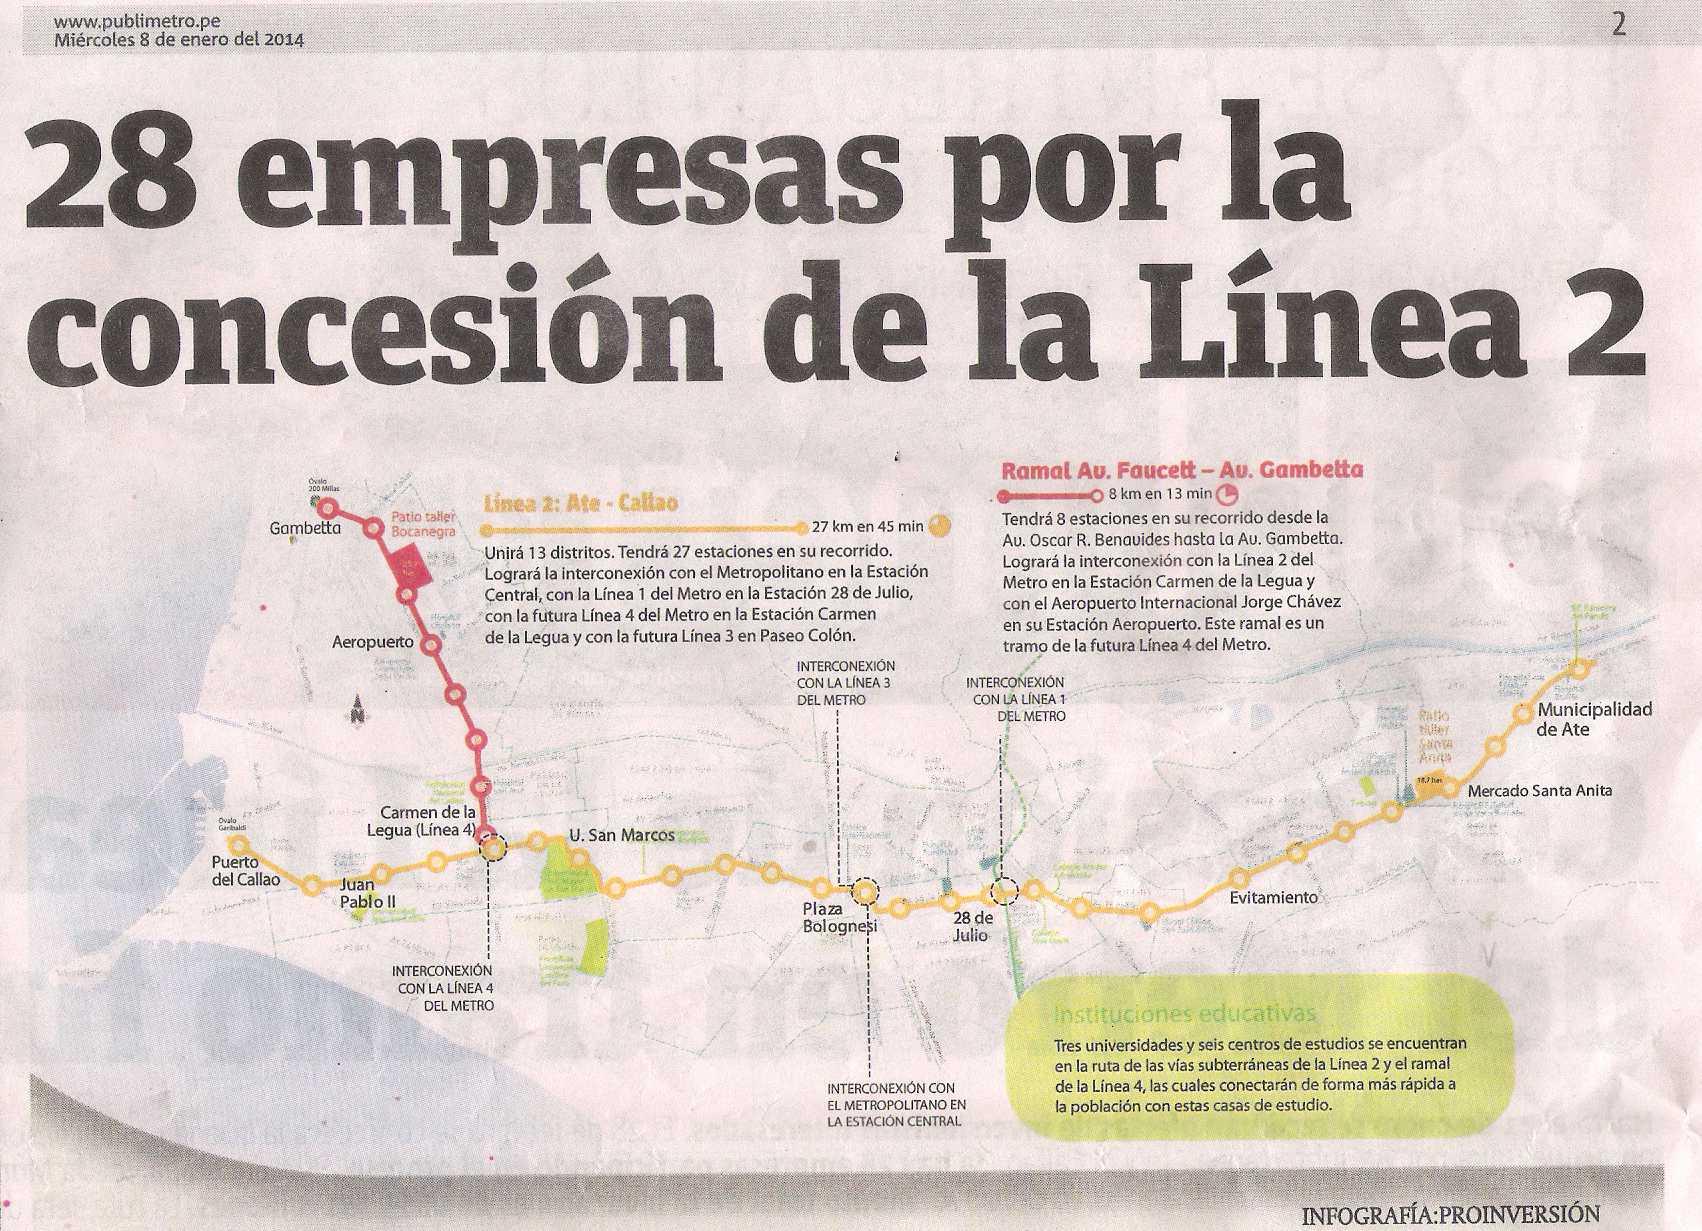 Linea 2 del Metro de Lima